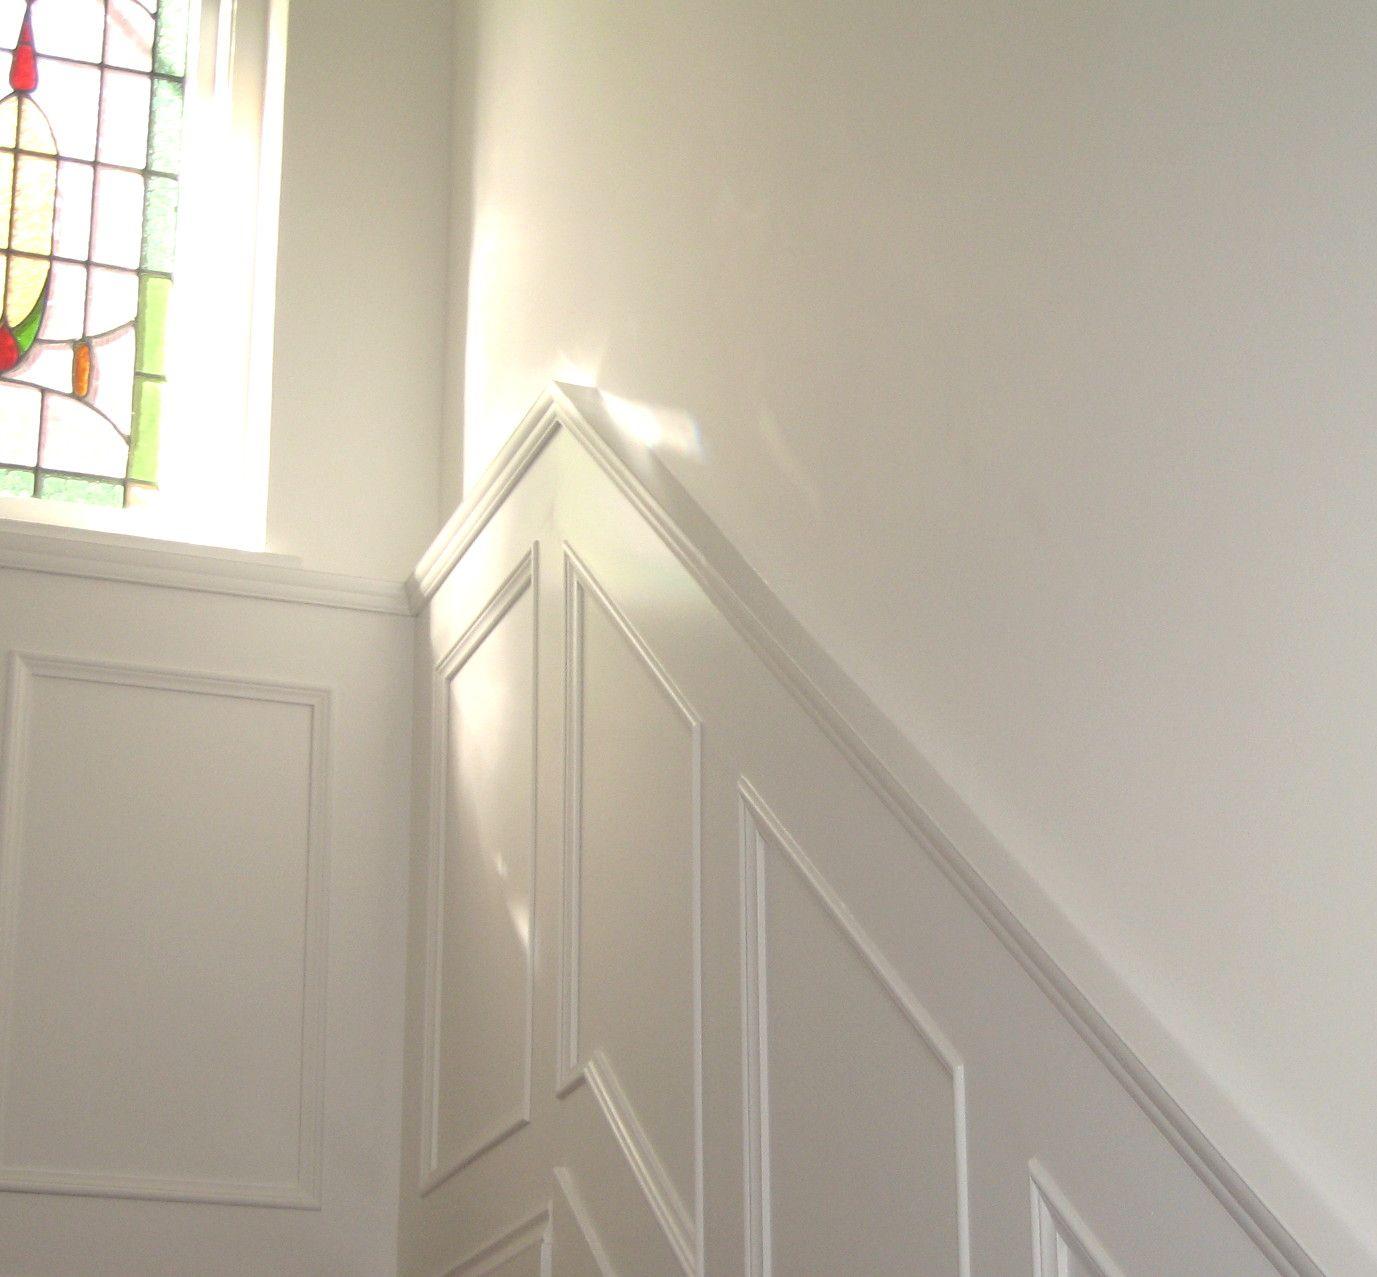 inspiring painted wall paneling home remodel pinterest. Black Bedroom Furniture Sets. Home Design Ideas